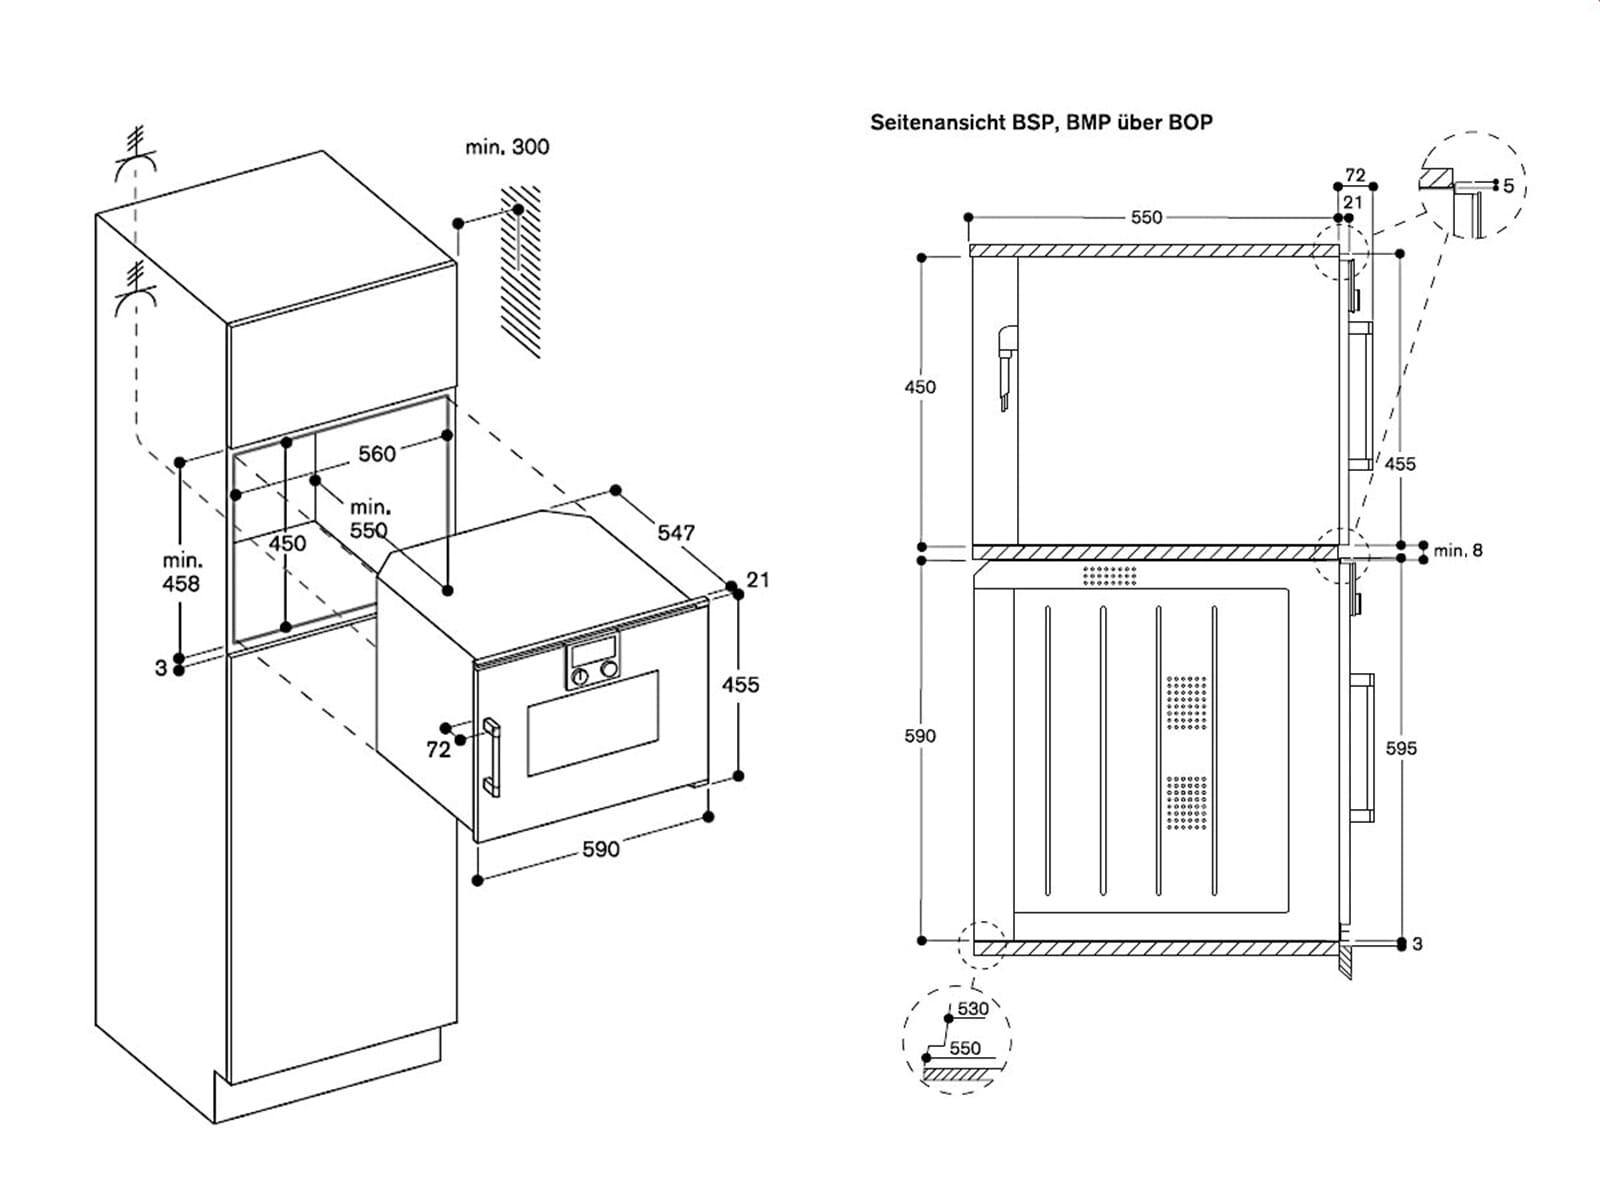 Gaggenau BSP 221 100 Kompakt Dampfgarer Serie 200 Anthrazit